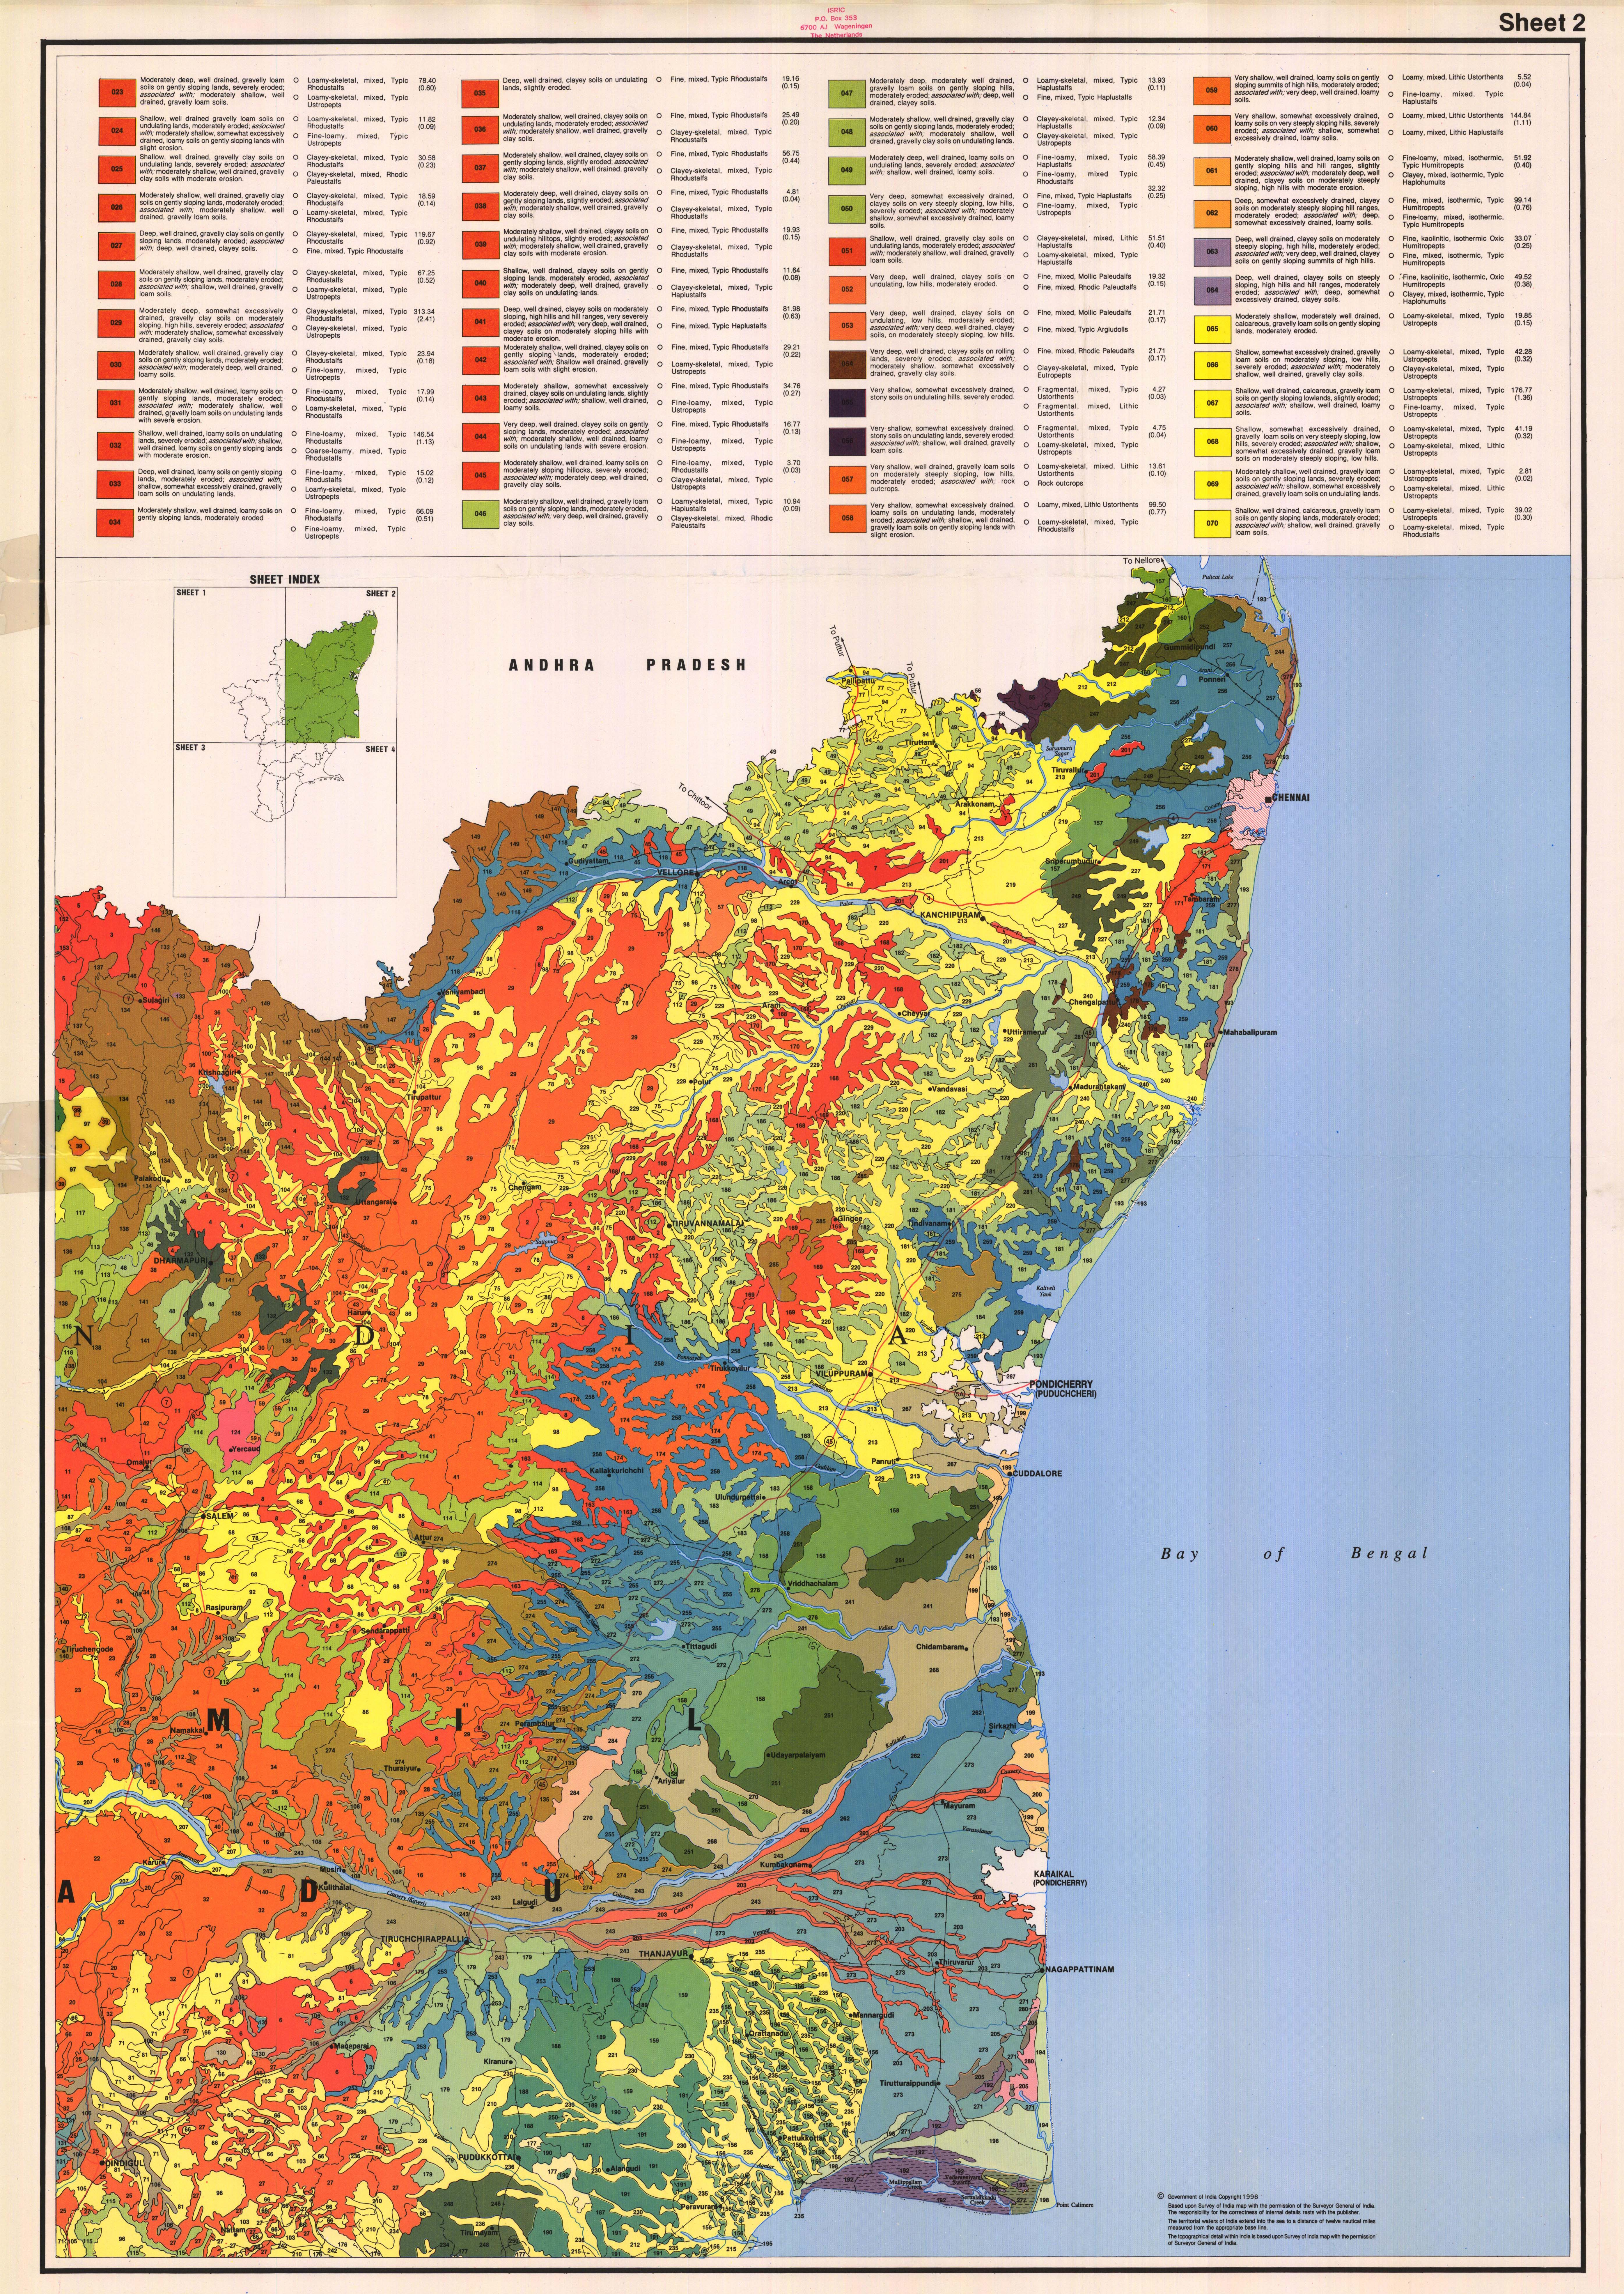 National soil maps eudasm esdac european commission tamil nadu soils sheet 2 gumiabroncs Gallery